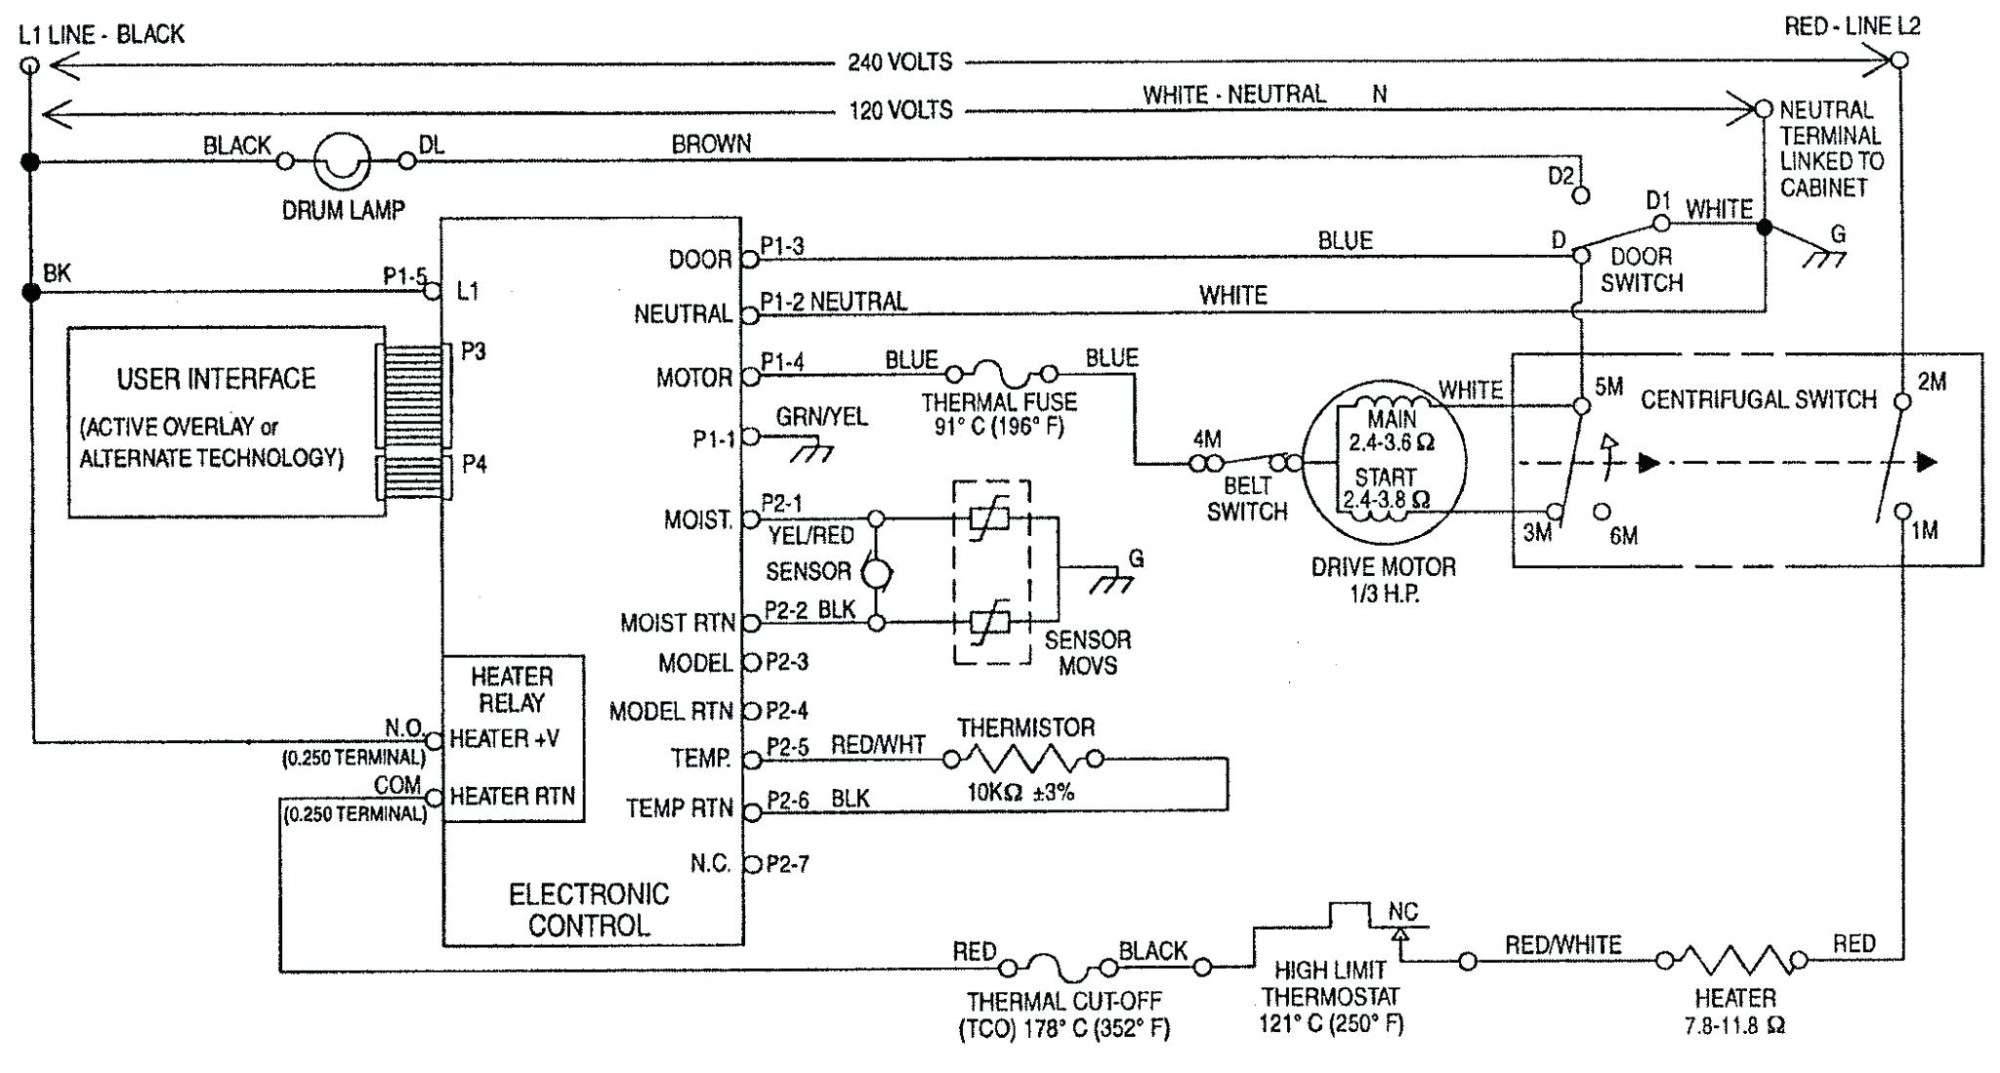 hight resolution of dart controls 250 series wiring diagram ge dryer wiring diagram timer electric free download car